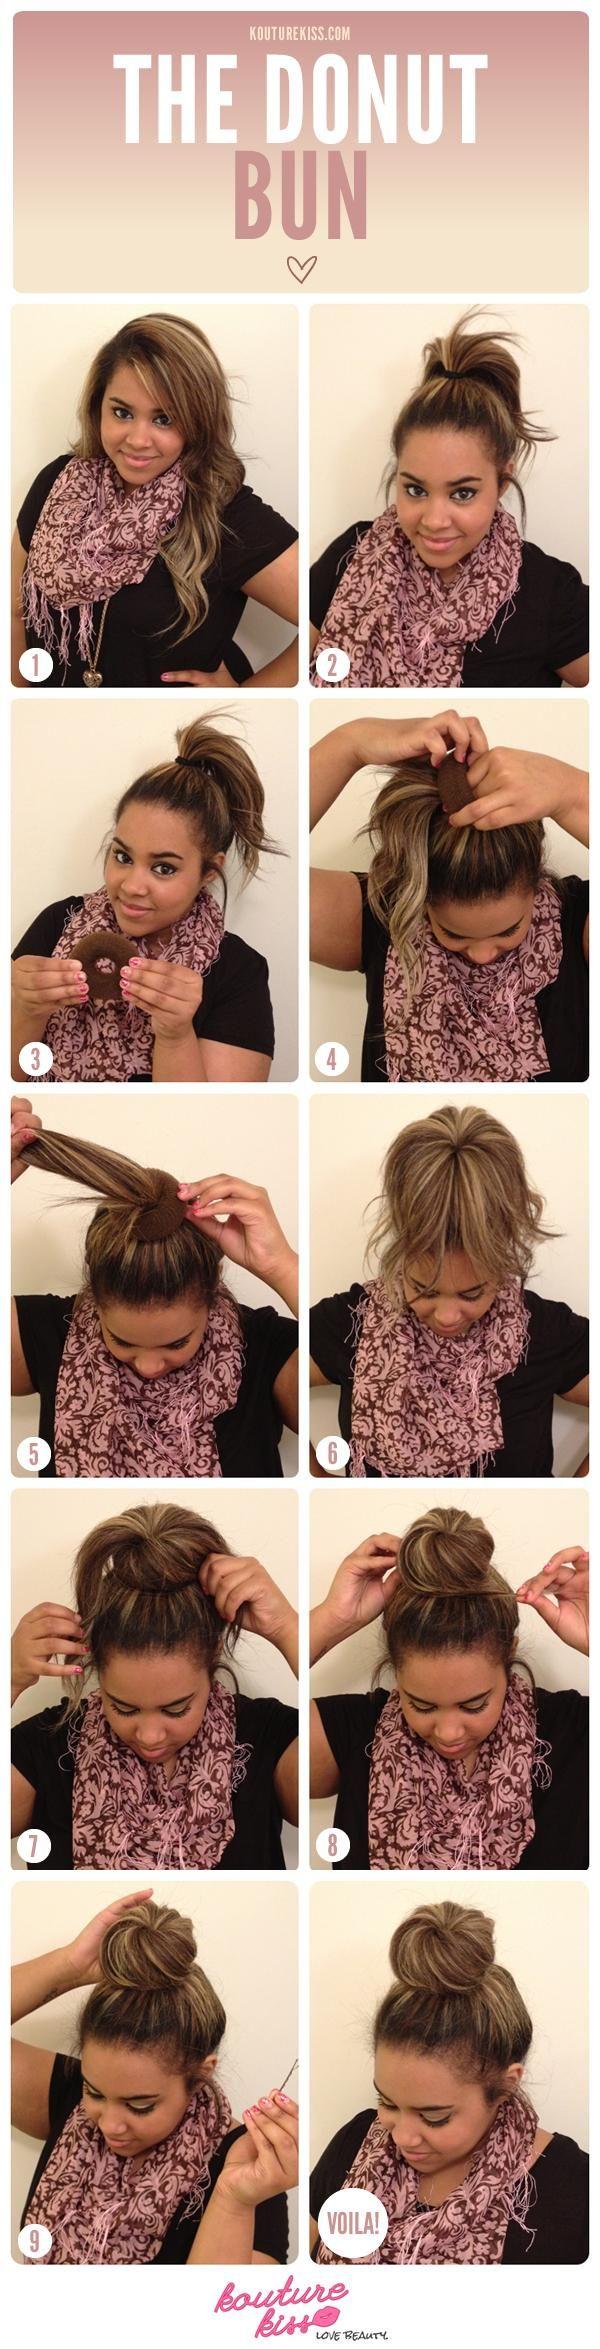 Peachy 1000 Ideas About Donut Bun Hairstyles On Pinterest Donut Bun Short Hairstyles Gunalazisus